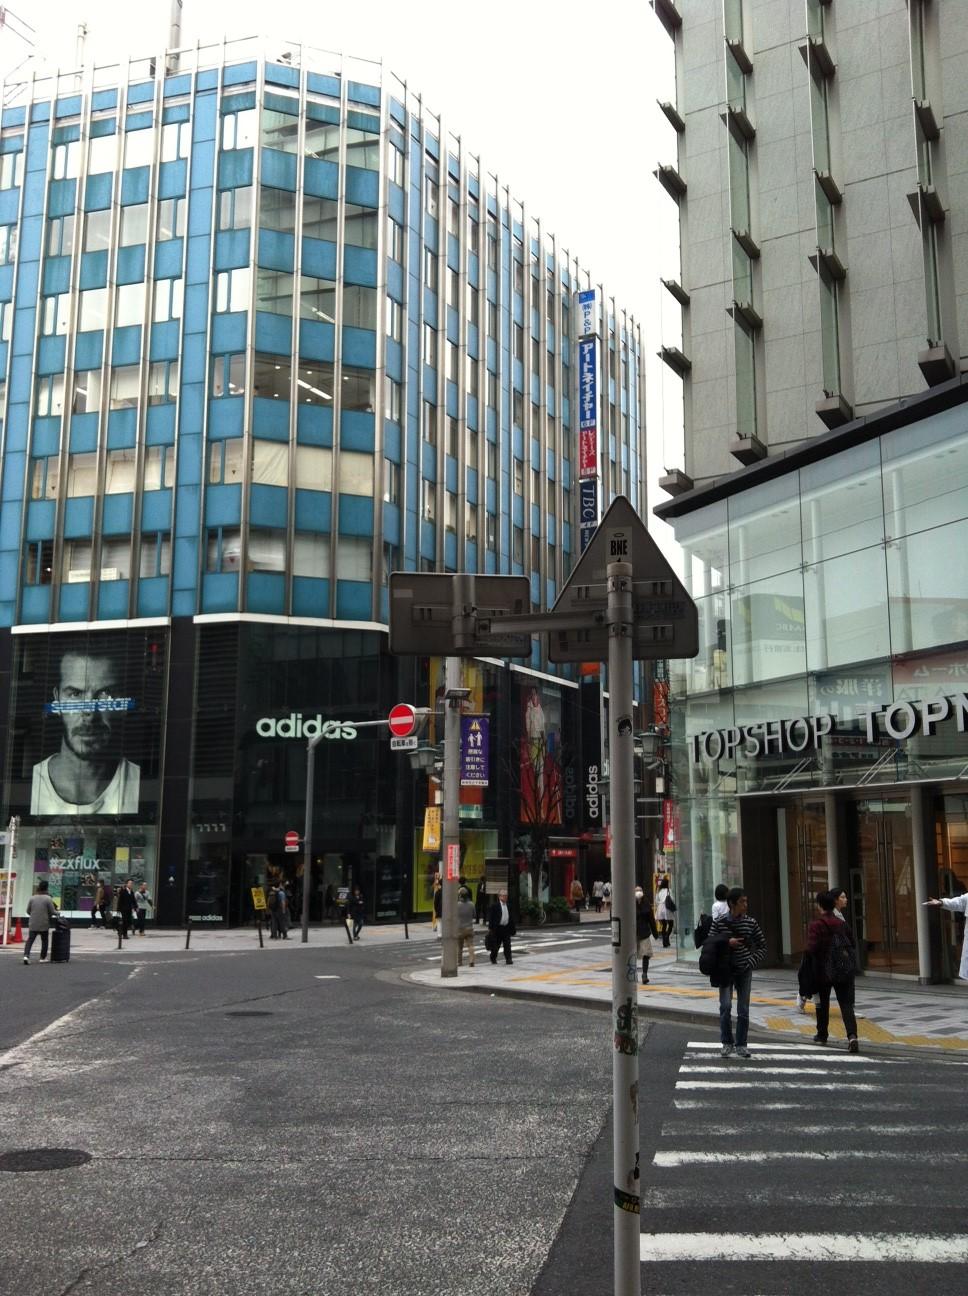 http://www.washin-optical.co.jp/blog/ladies/%E4%B8%AD%E5%A4%AE%E6%9D%B1%E5%8F%A3%E5%9C%B0%E4%B8%8A.jpeg